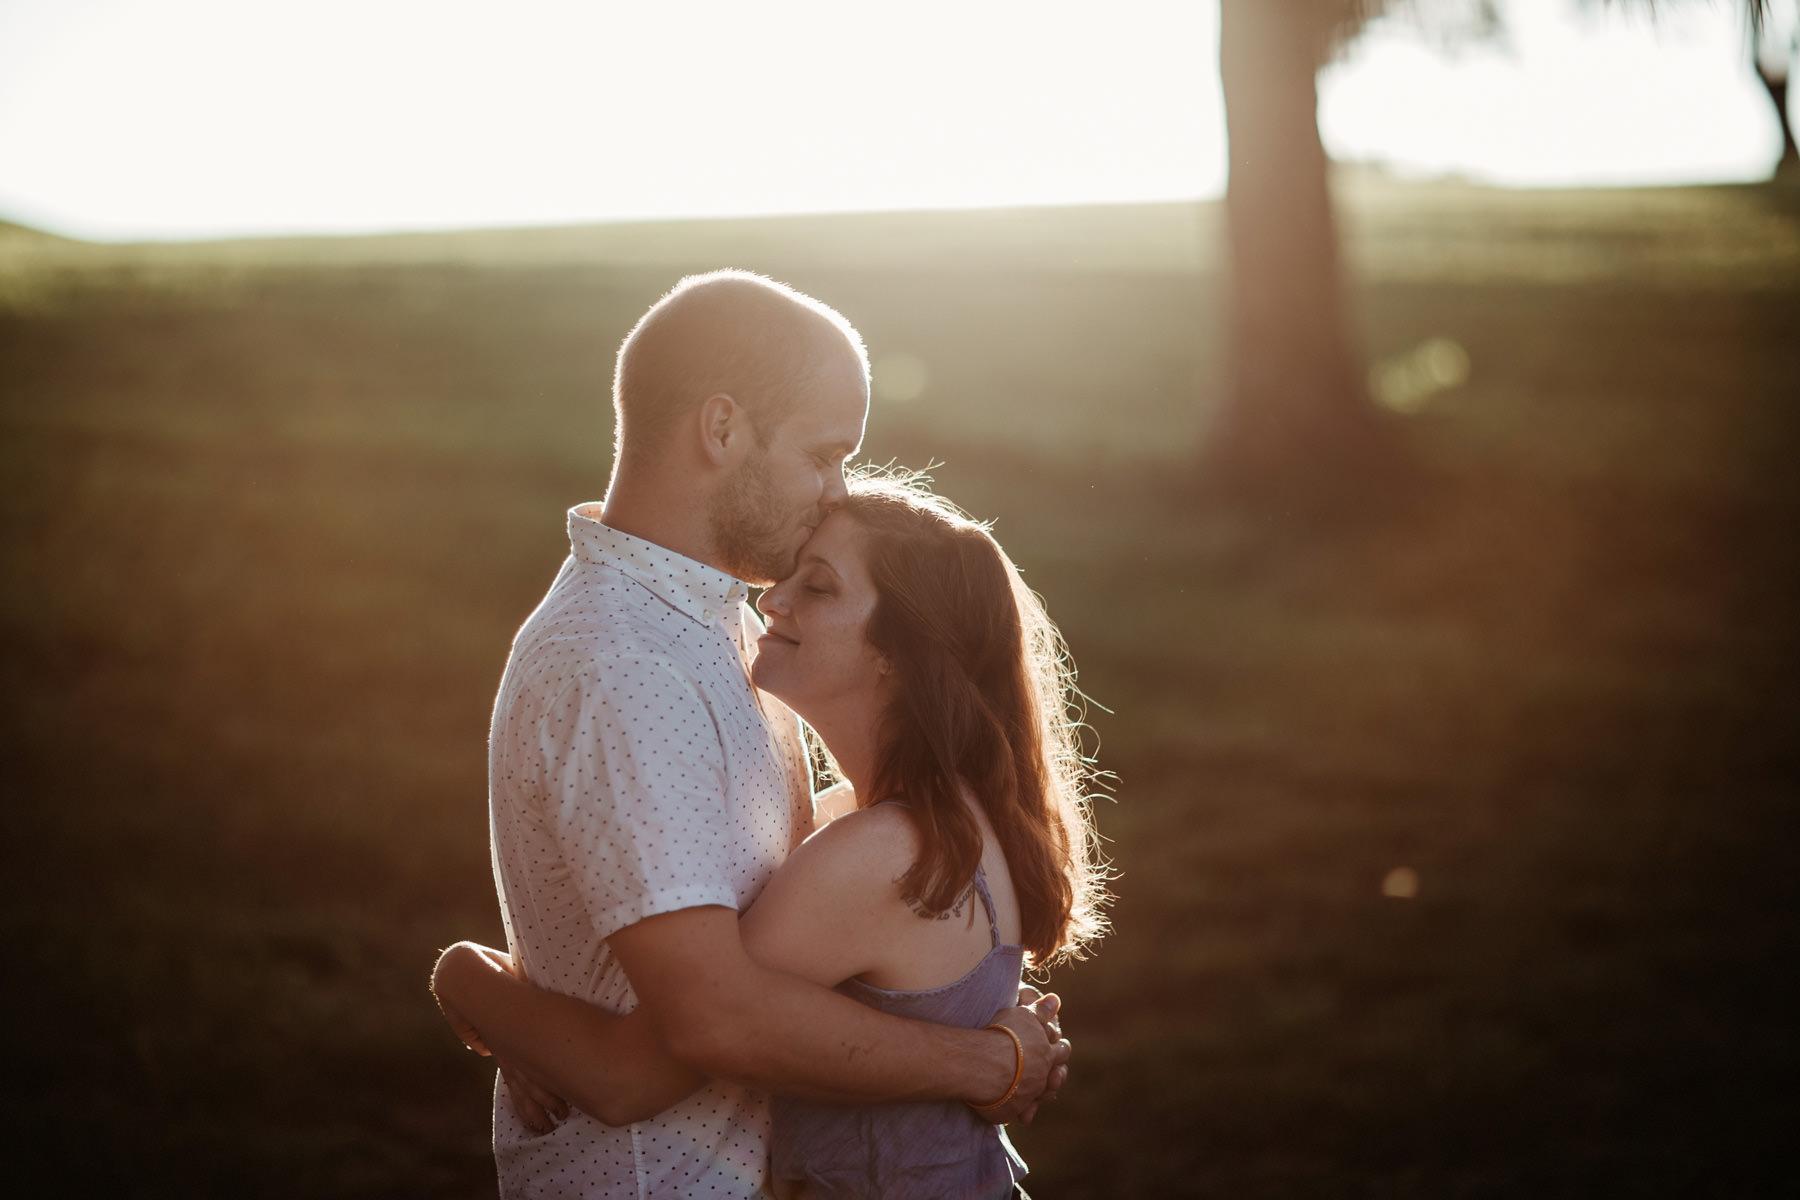 Kansas City_Penn Valley Park_Engagement Session_Kindling Wedding Photography09.JPG